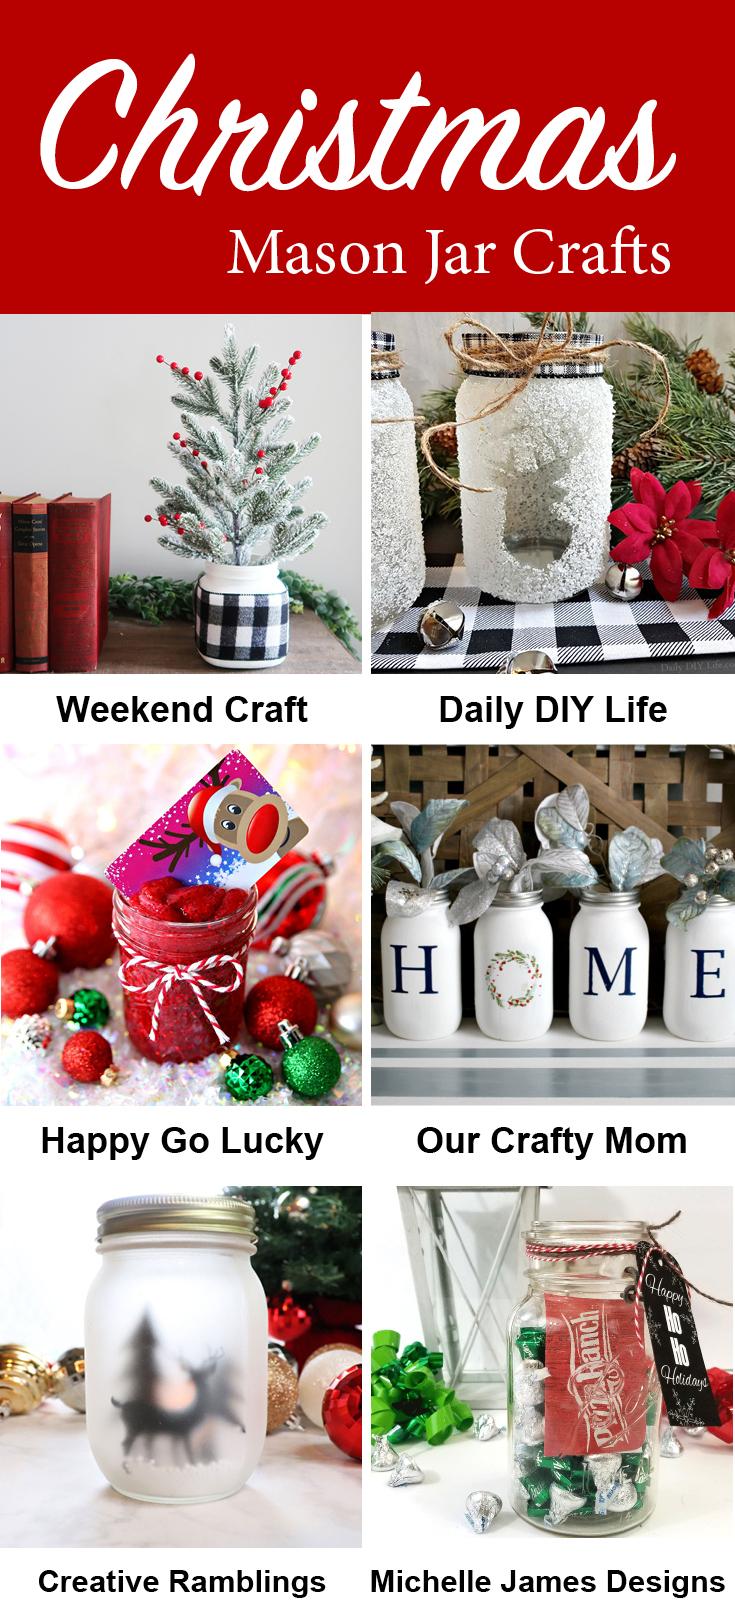 Christmas-Mason-Jar-Crafts.jpg